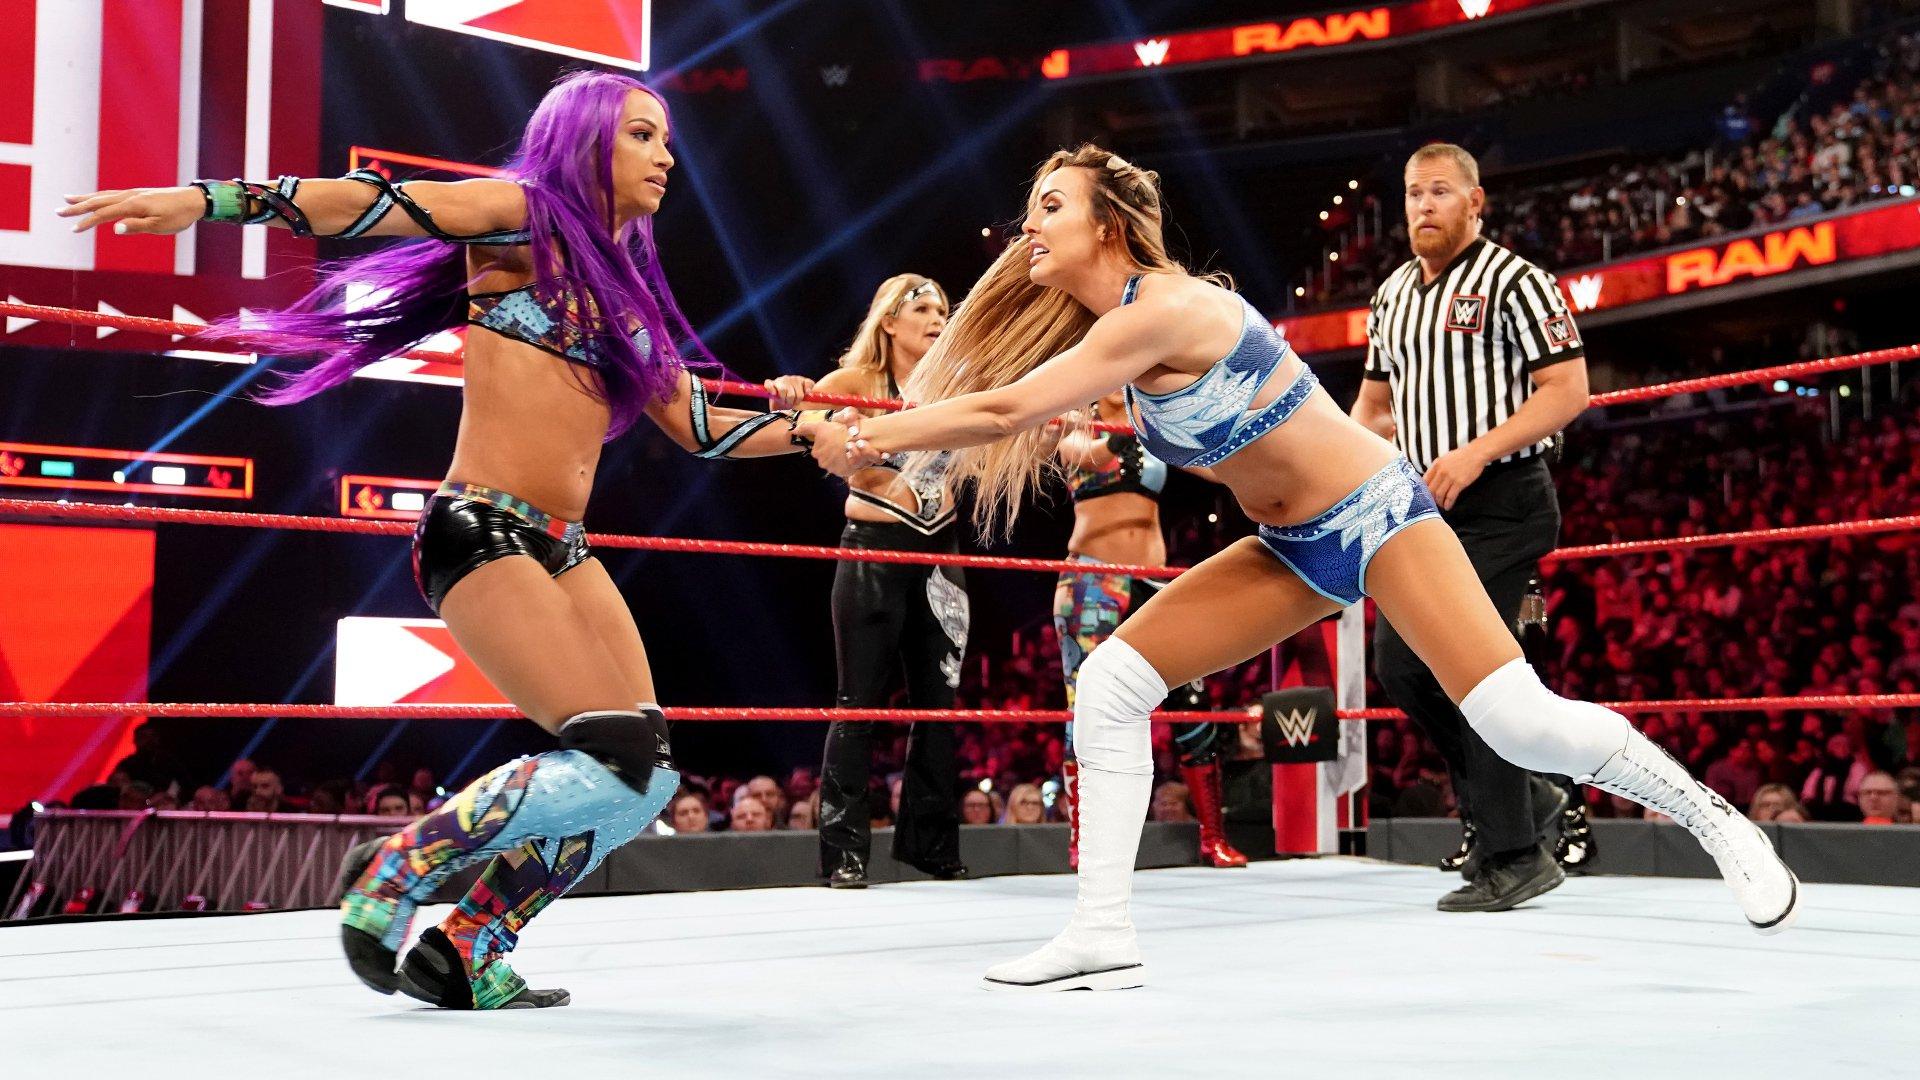 Sasha Banks, Bayley, Beth Phoenix & Natalya vs. Nia Jax, Tamina & The IIconics: Raw, 1er Avril 2019